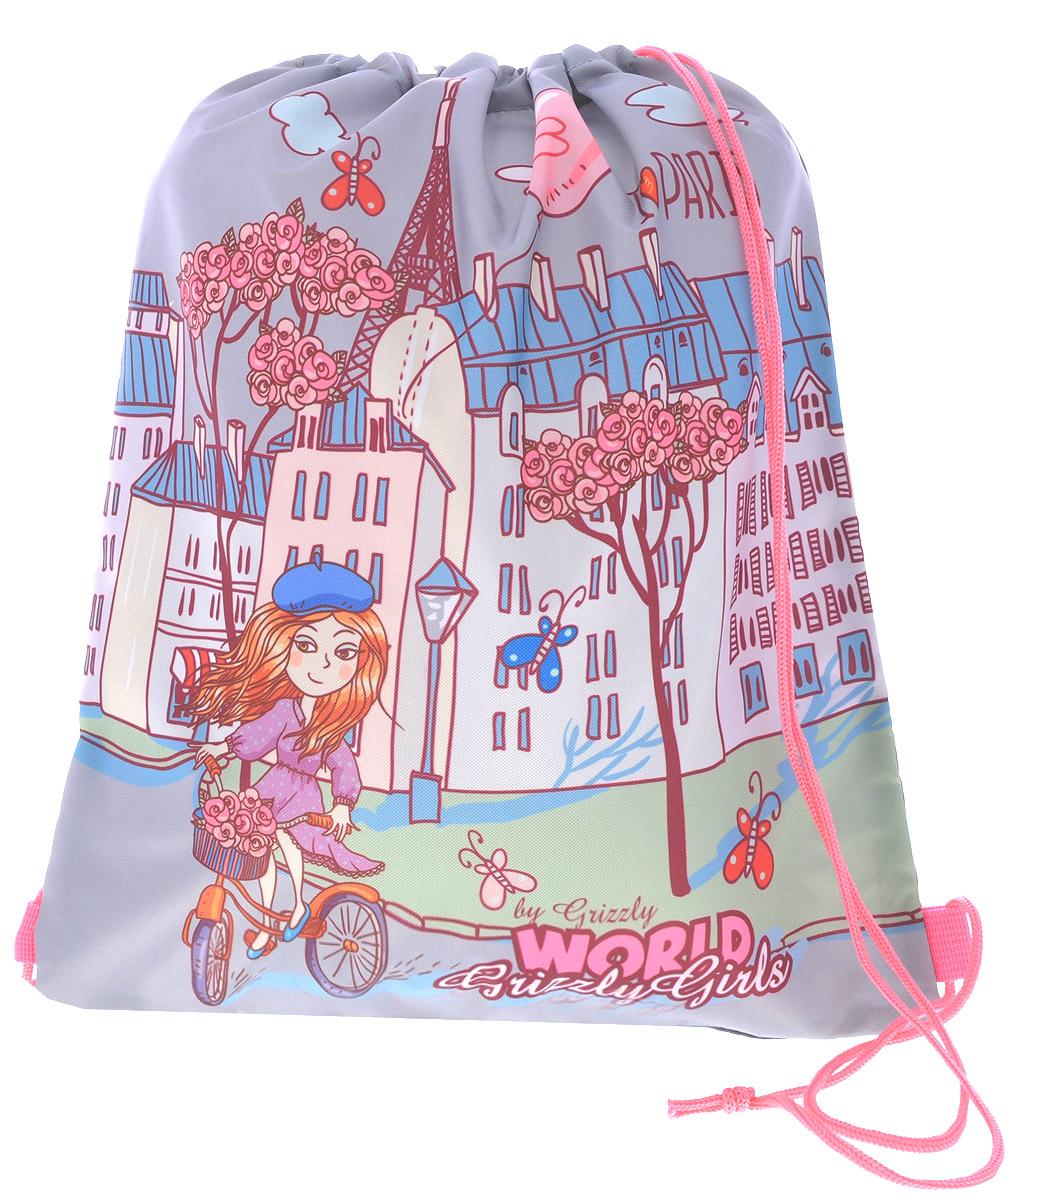 Grizzly Мешок для обуви World Grizzly Girls цвет серый розовый